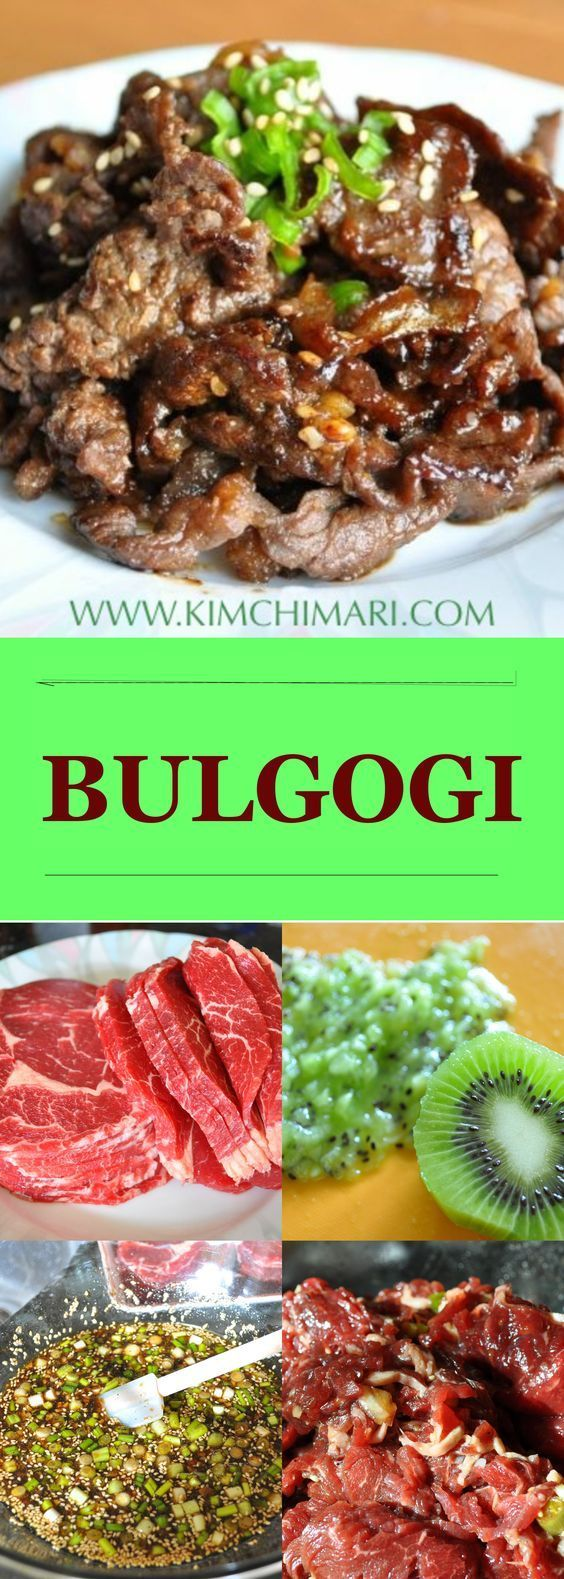 Bulgogi - Authentic Korean Beef BBQ   Asian recipes, Beef ...